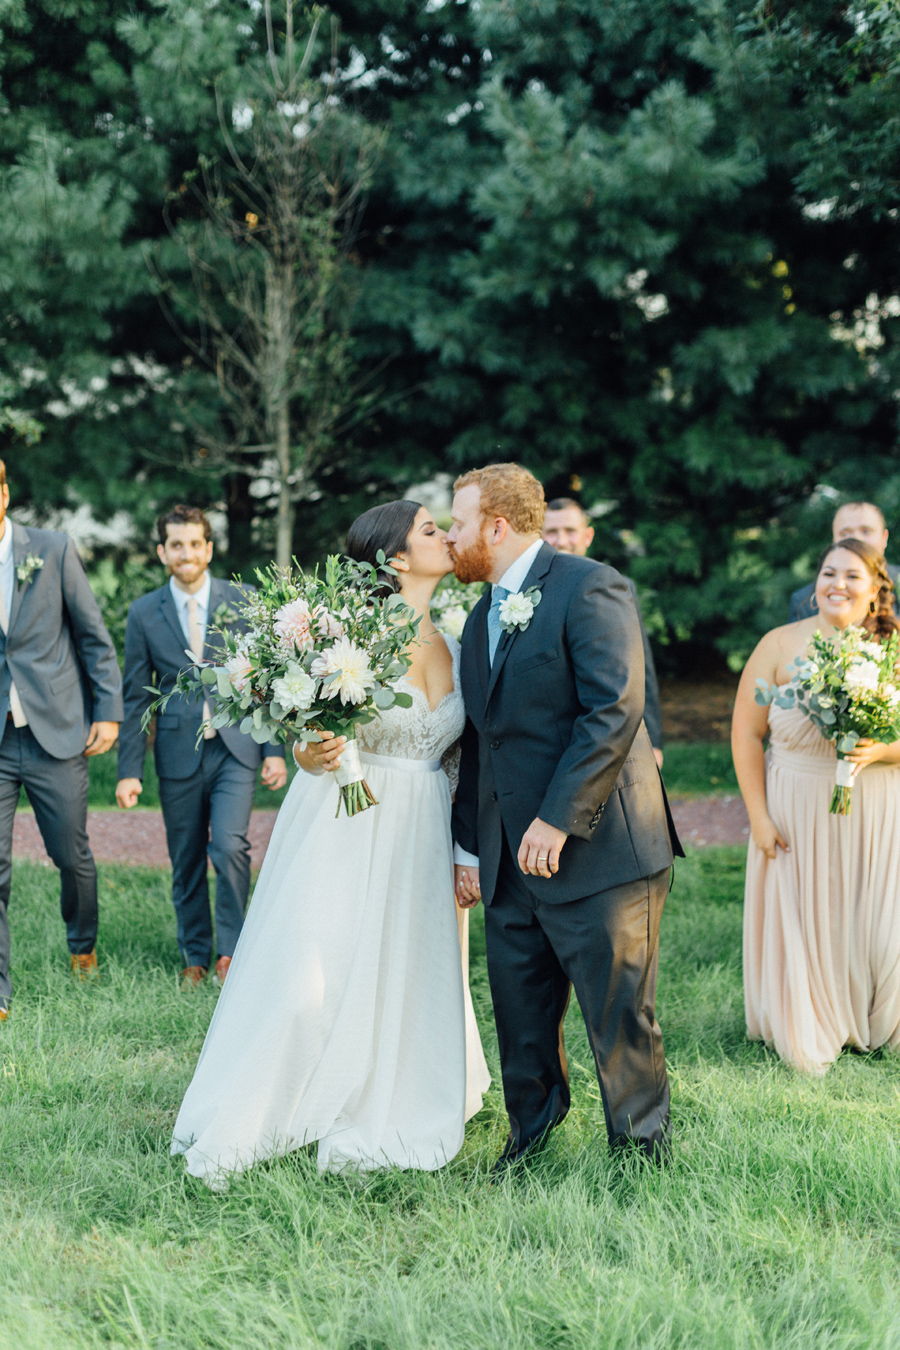 the-inn-at-leola-wedding-lancaster-pennsylvania-wedding-photographer-rebeka-viola-photograhy (72).jpg